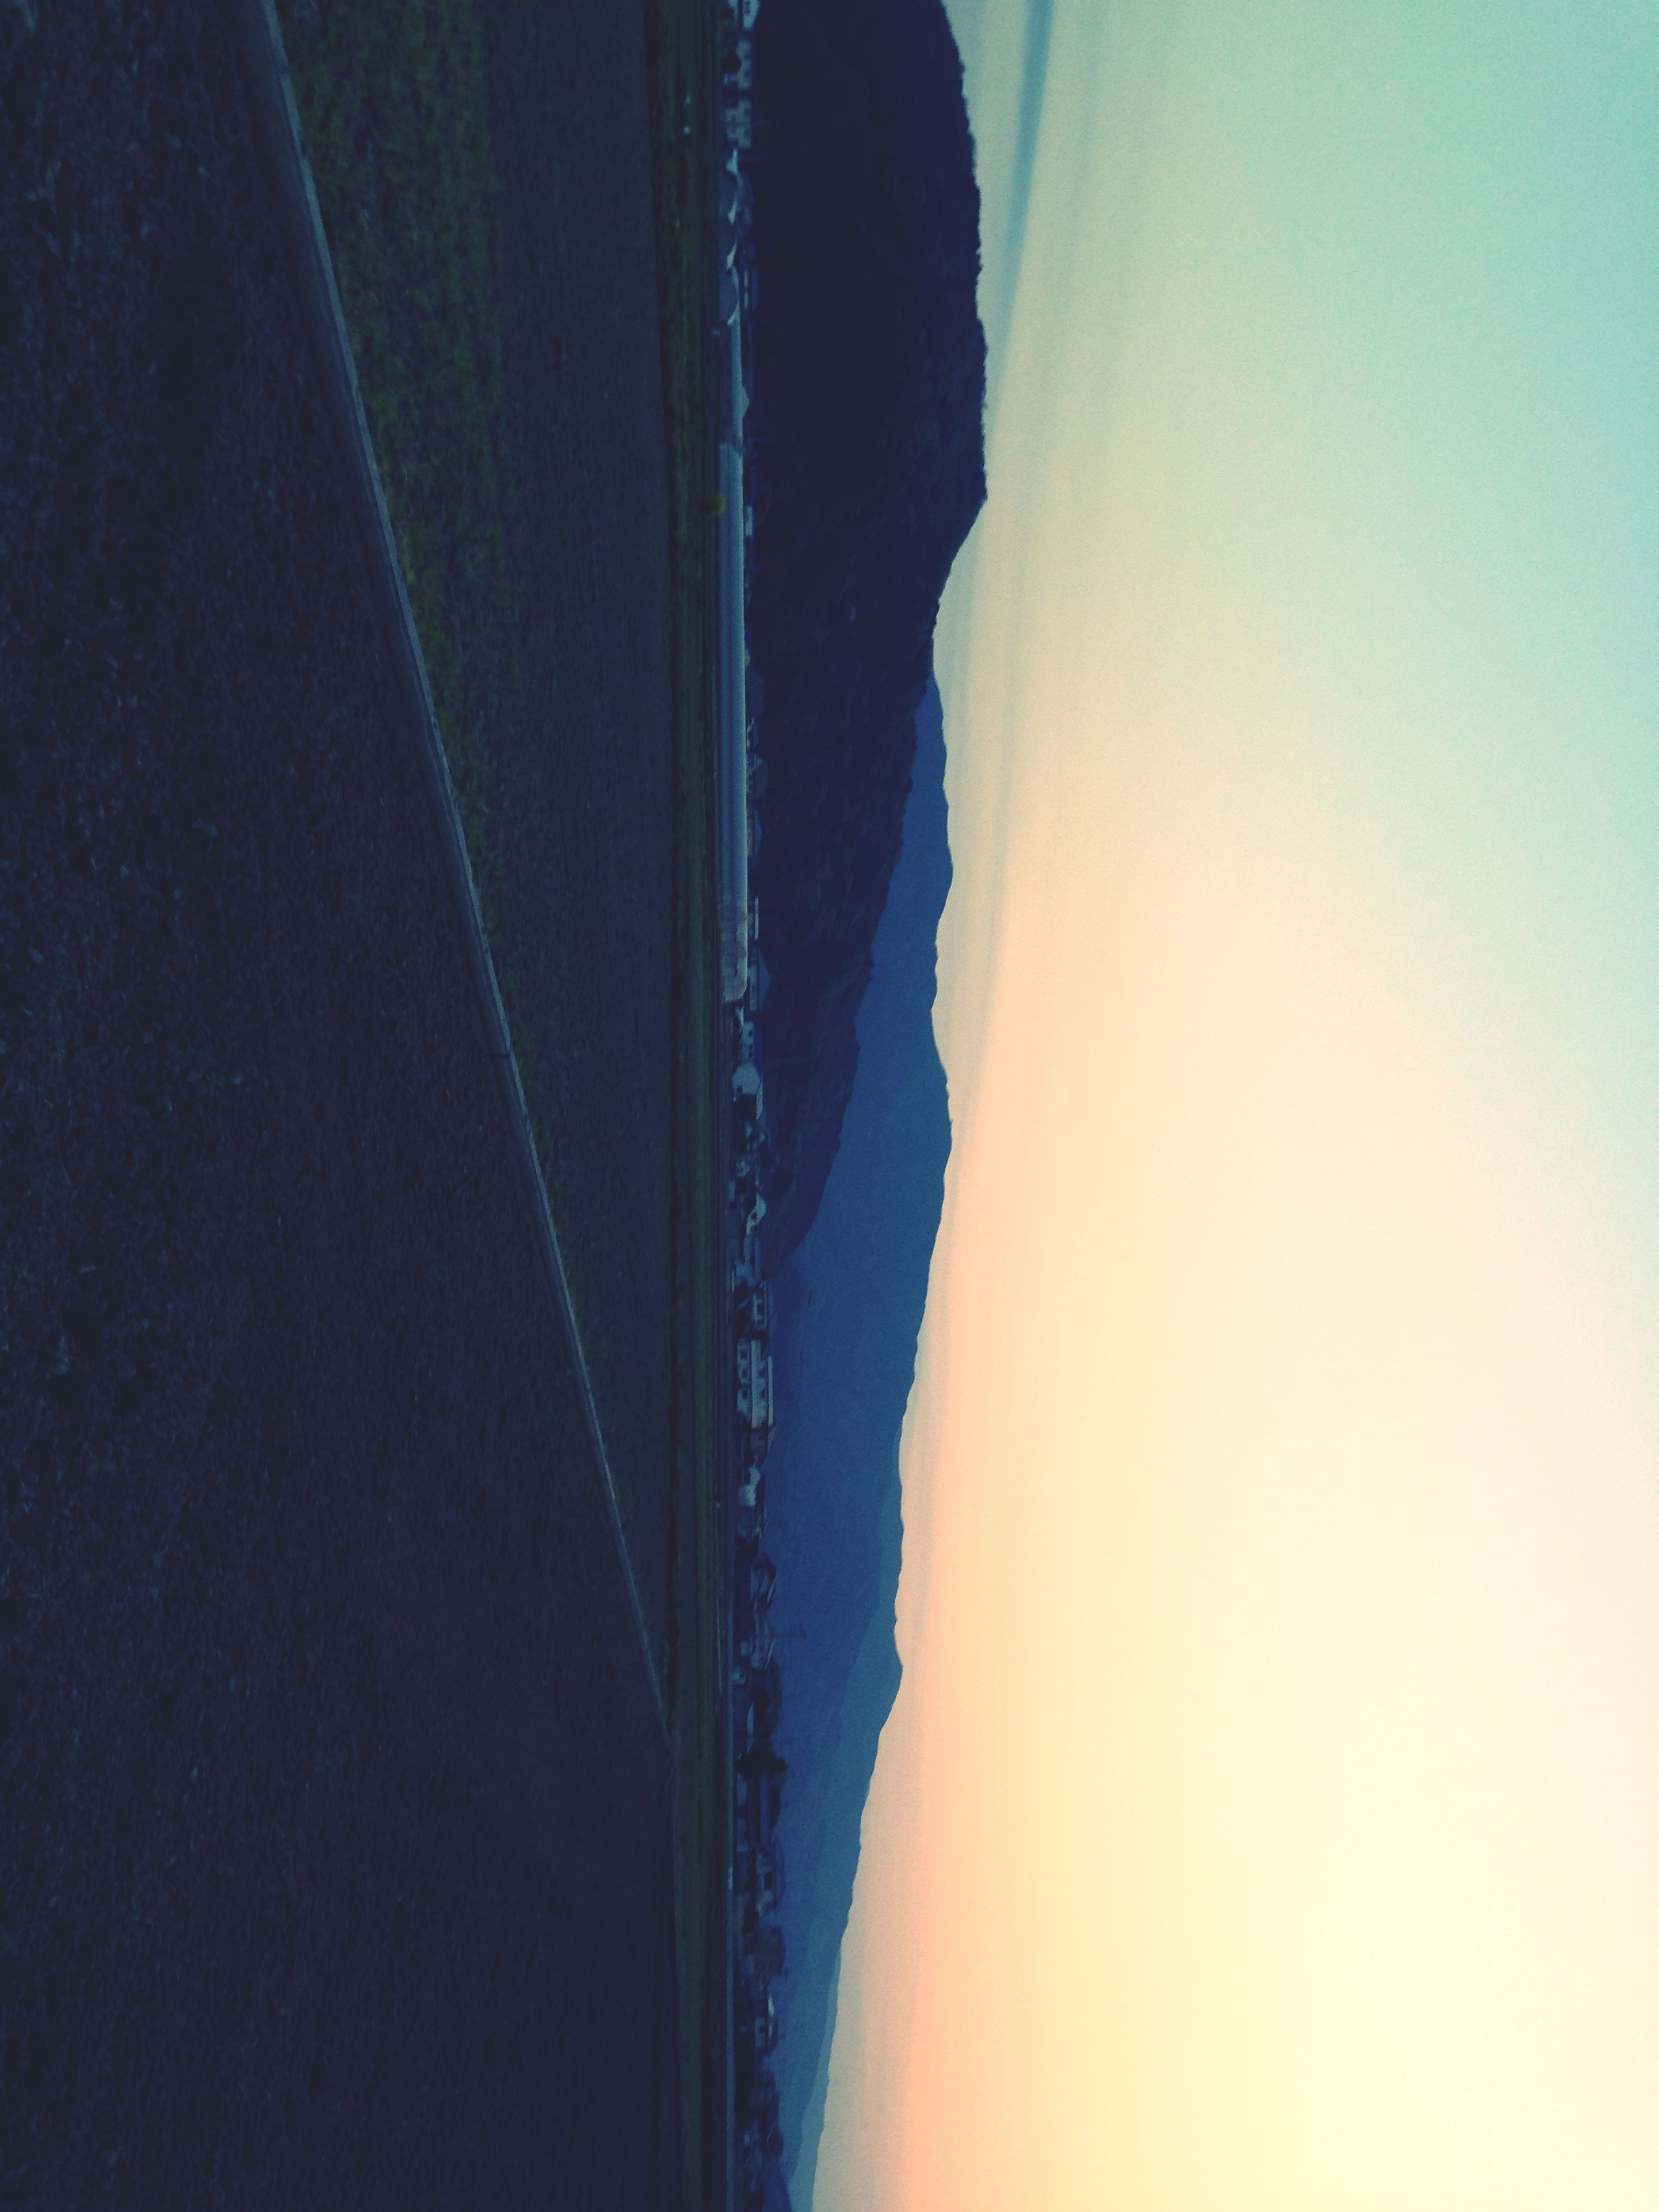 tranquil scene, tranquility, mountain, scenics, beauty in nature, copy space, landscape, mountain range, nature, idyllic, winter, snow, clear sky, non-urban scene, cold temperature, remote, sky, weather, solitude, horizon over land